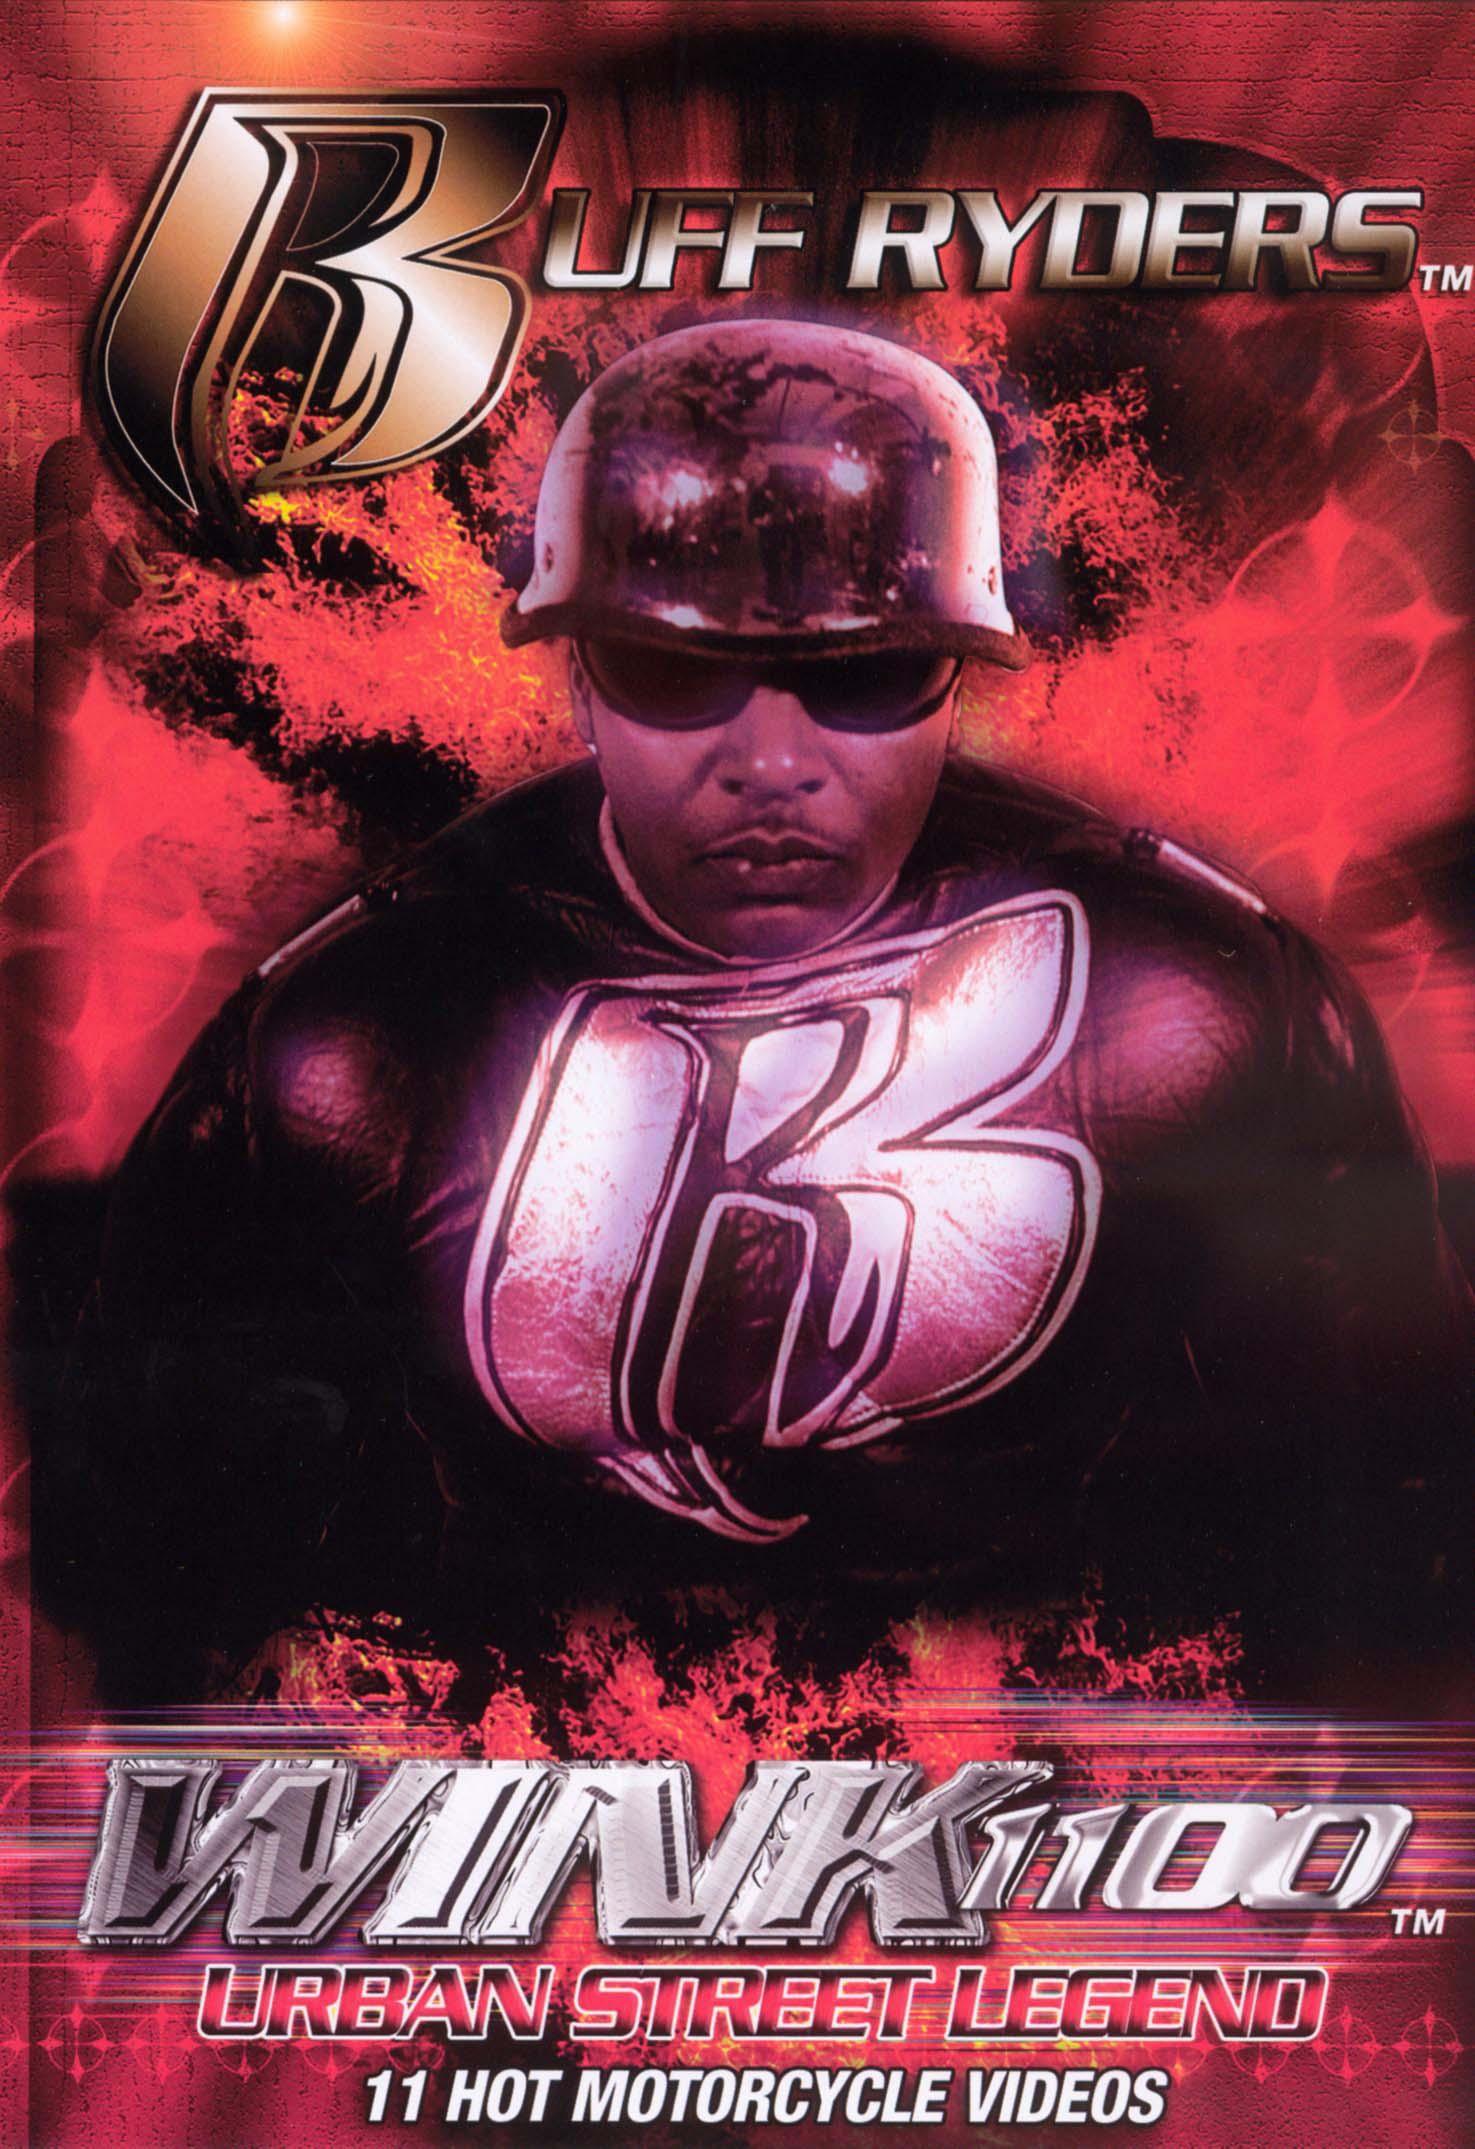 Ruff Ryders: Wink 1100 - Urban Street Legend